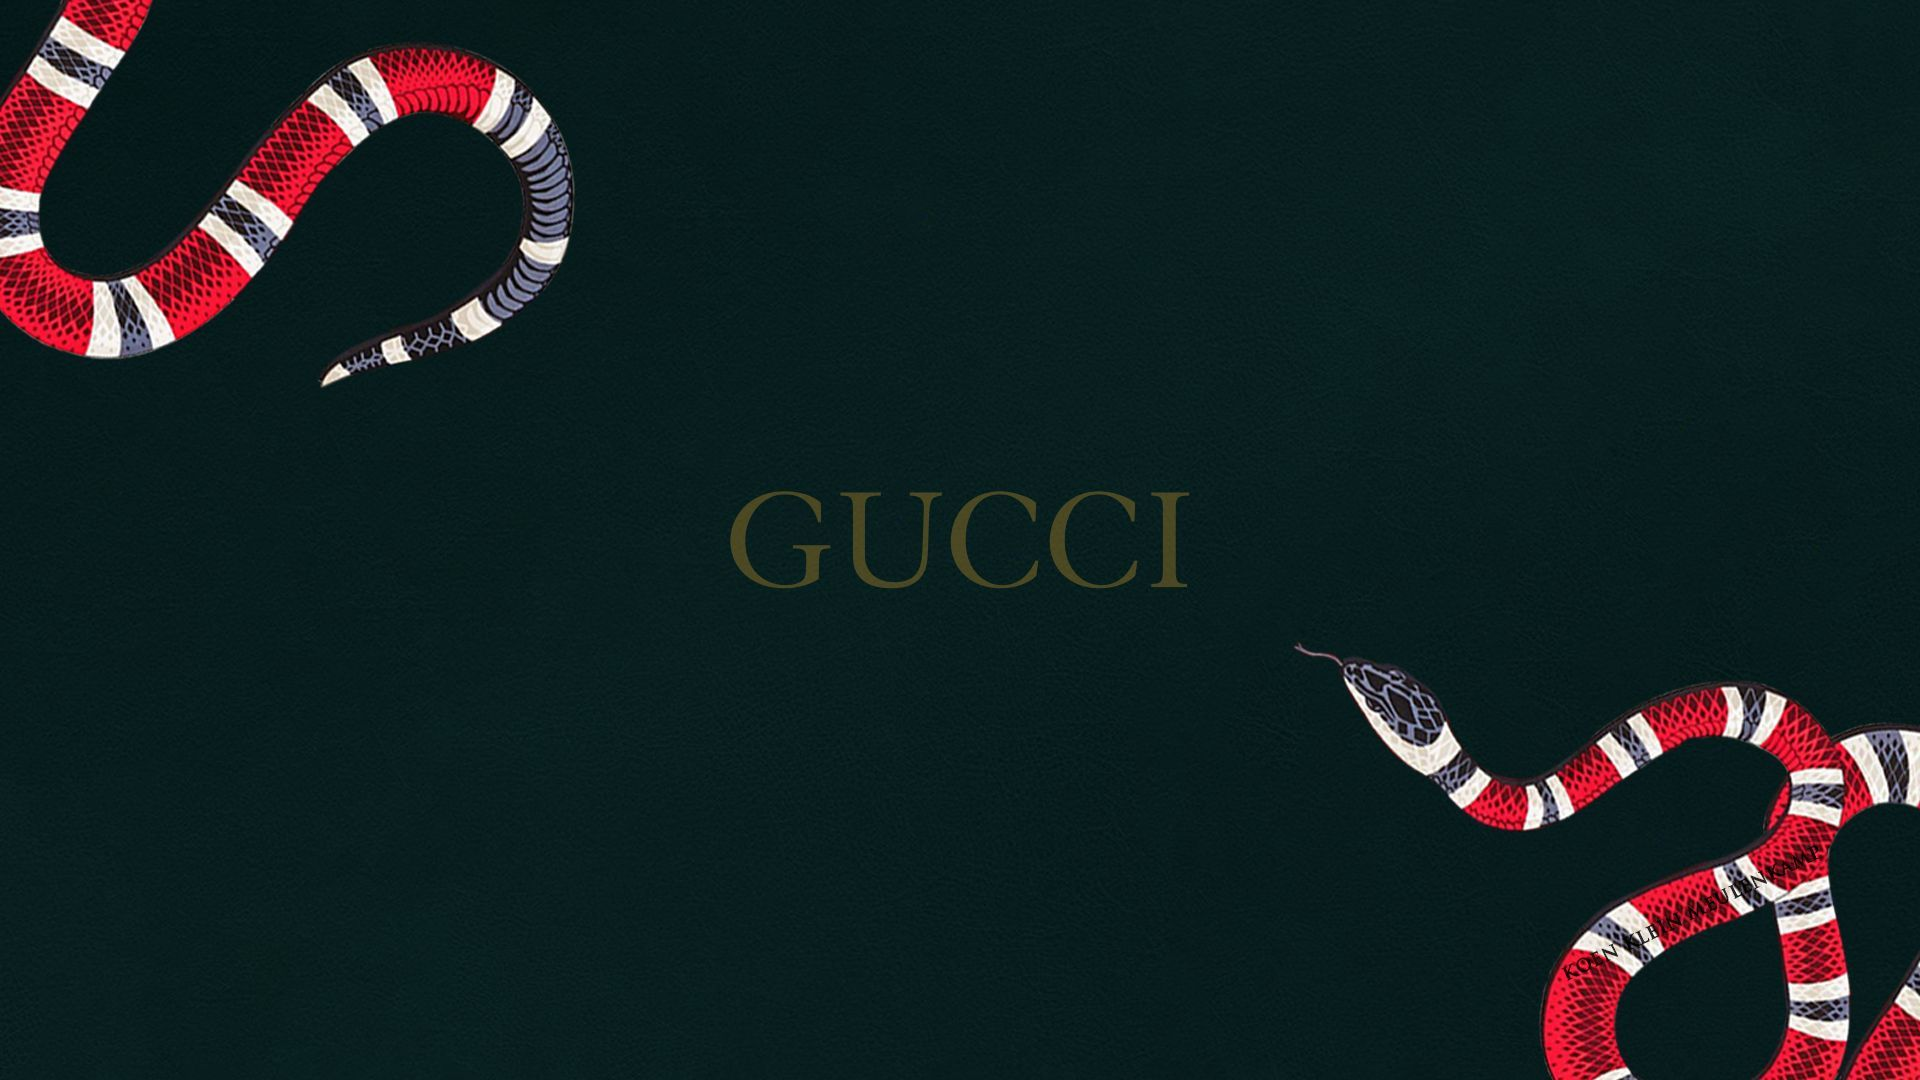 Gucci Snake wallpaper design – Amazing wallpaper Designs